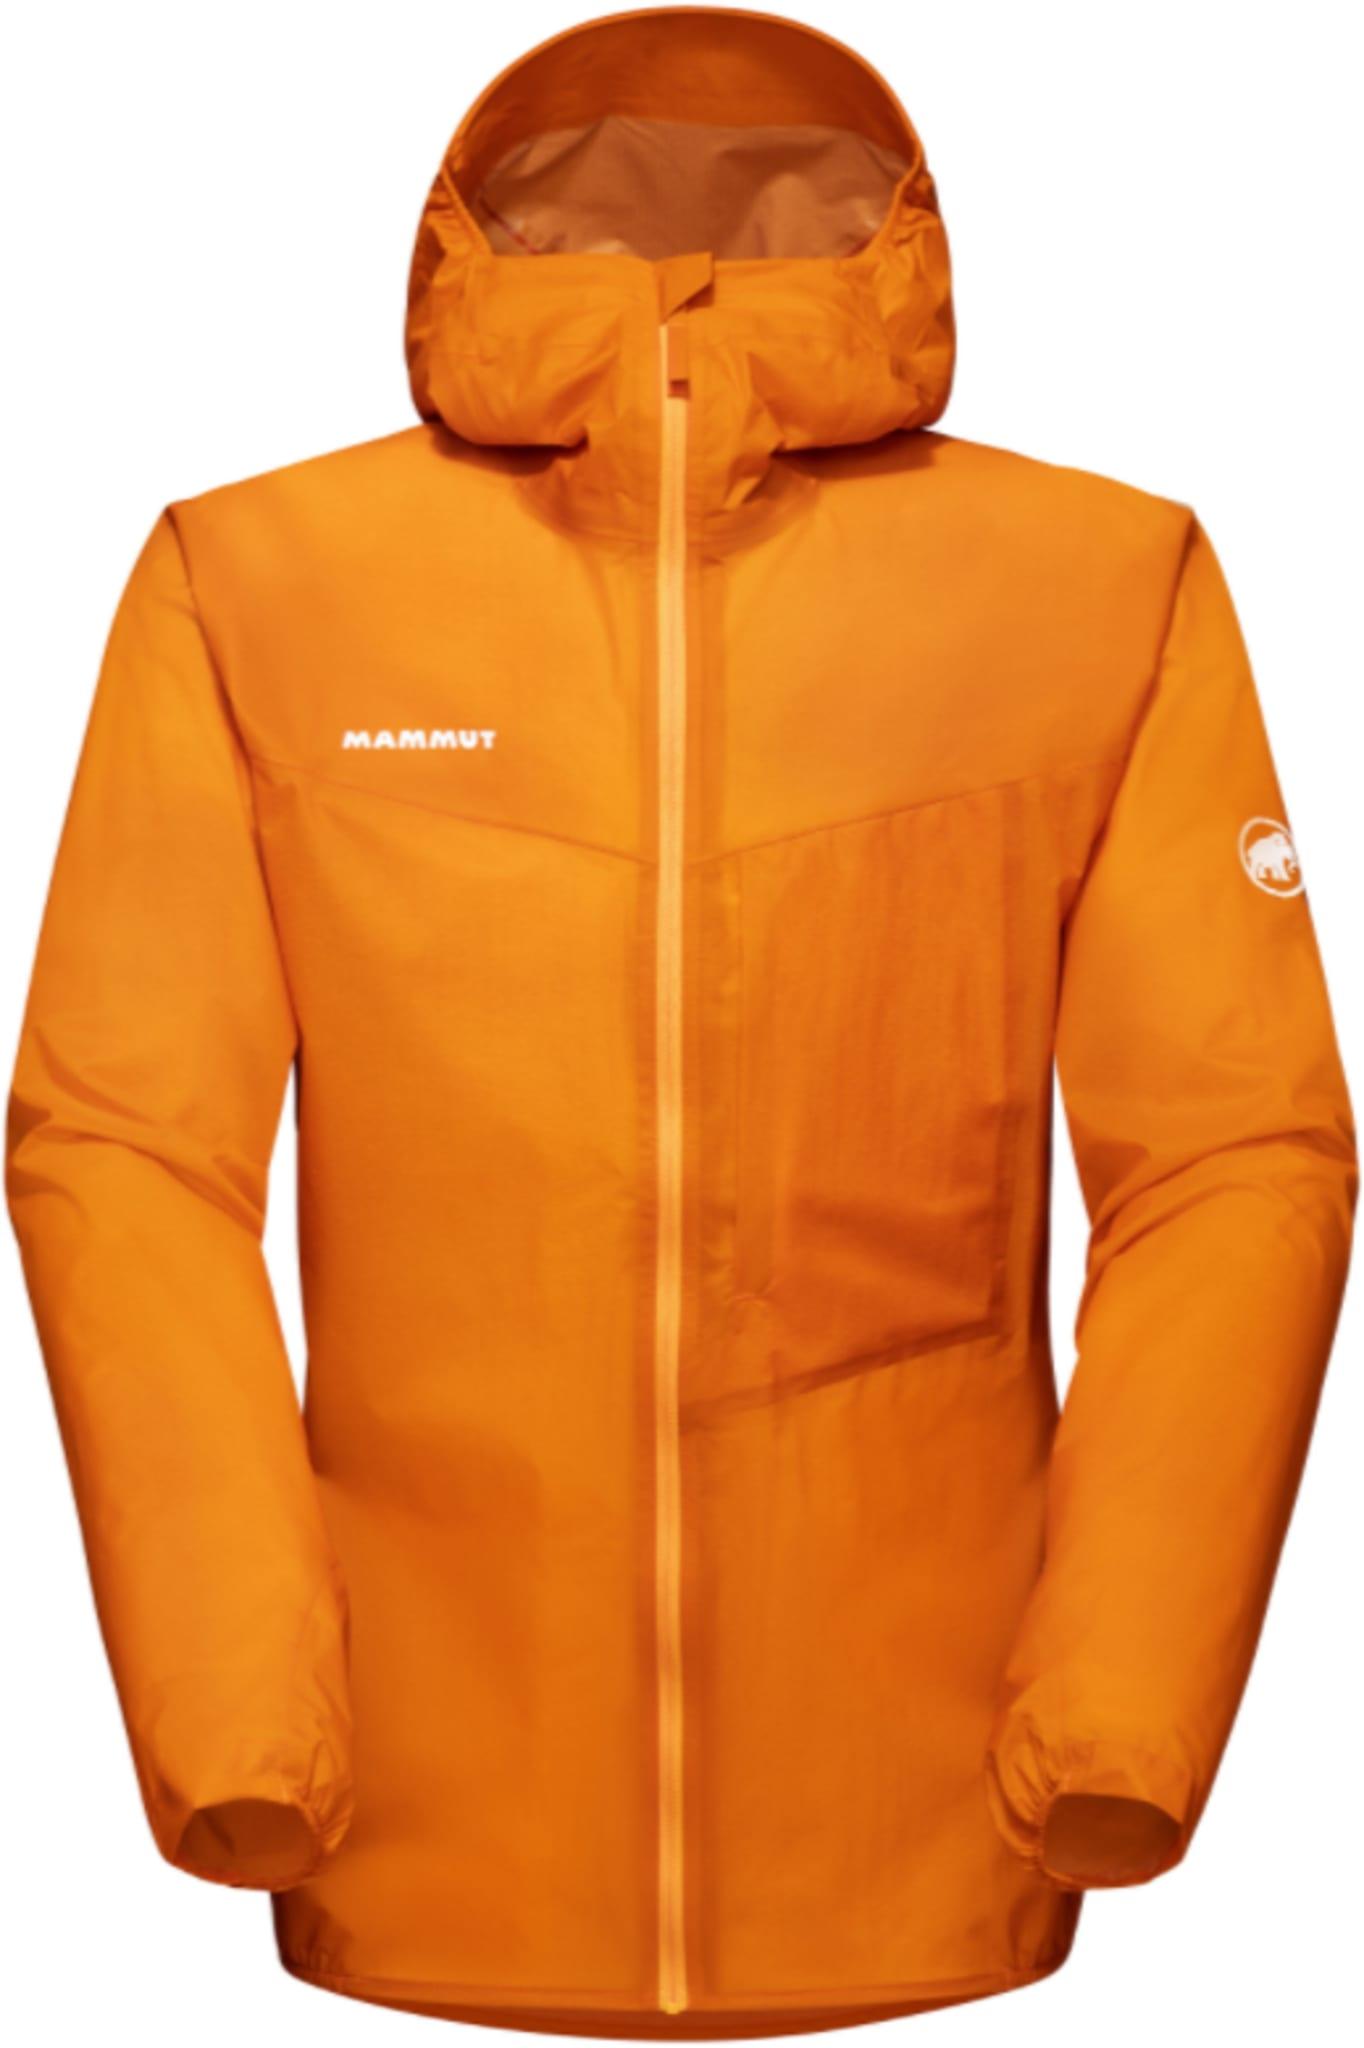 Kento Light HS Hooded Jacket Ms